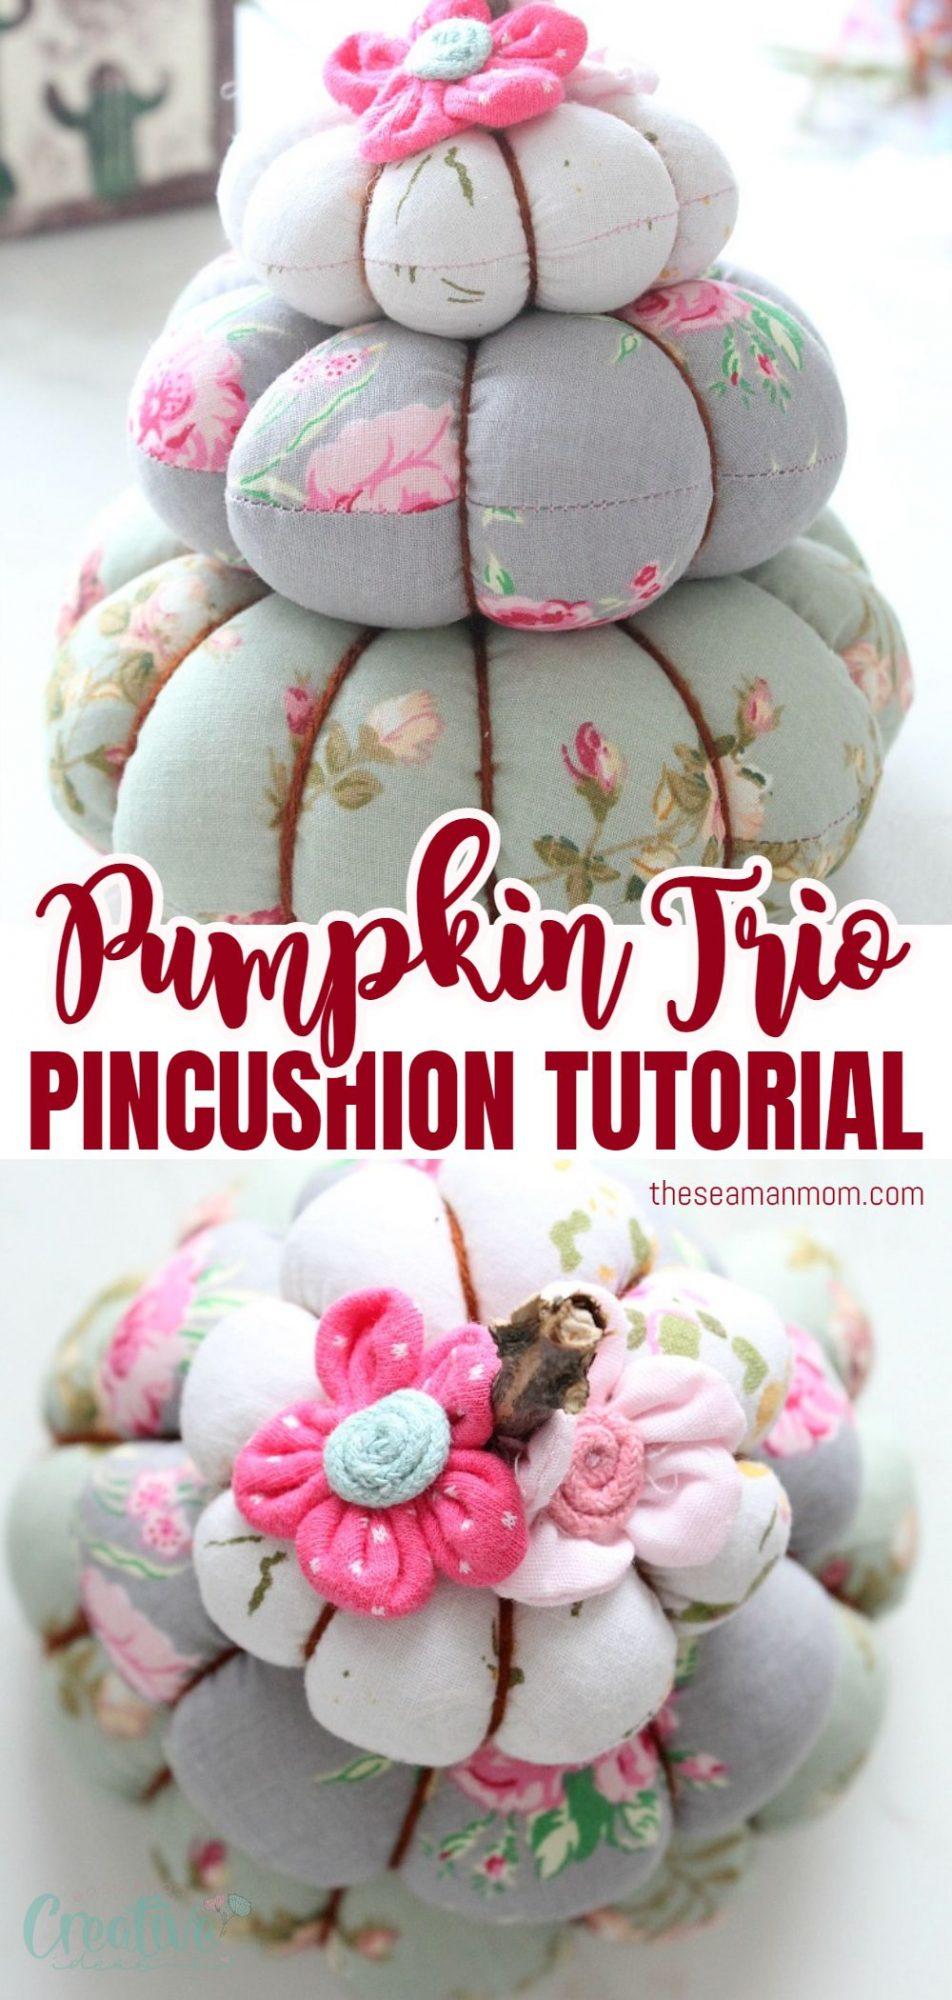 Photo collage of pumpkin pincushion made from three stacks of handmade fabric pumpkins